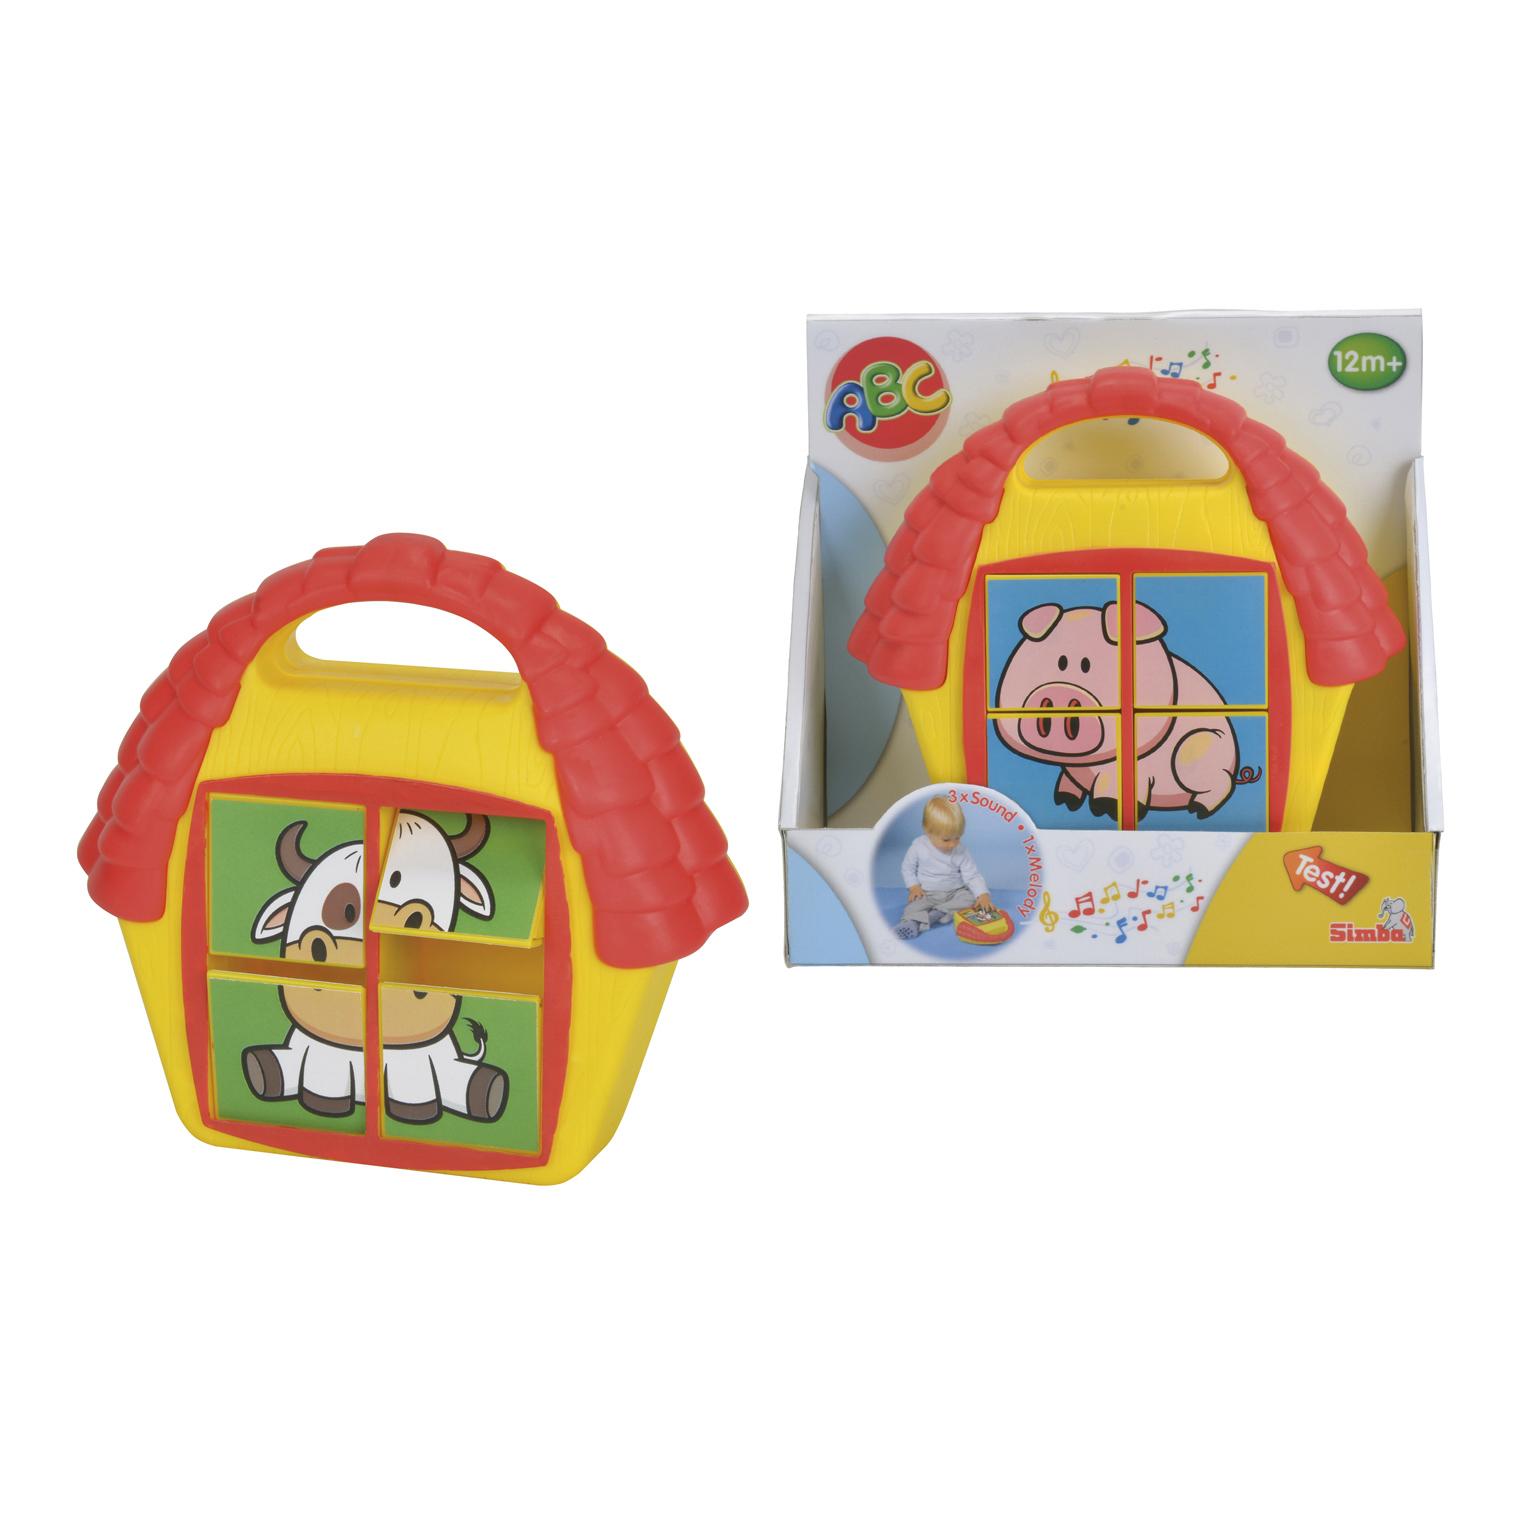 Кубики-пазл со звуком, 19 см.Развивающие игрушки Simba Baby<br>Кубики-пазл со звуком, 19 см.<br>